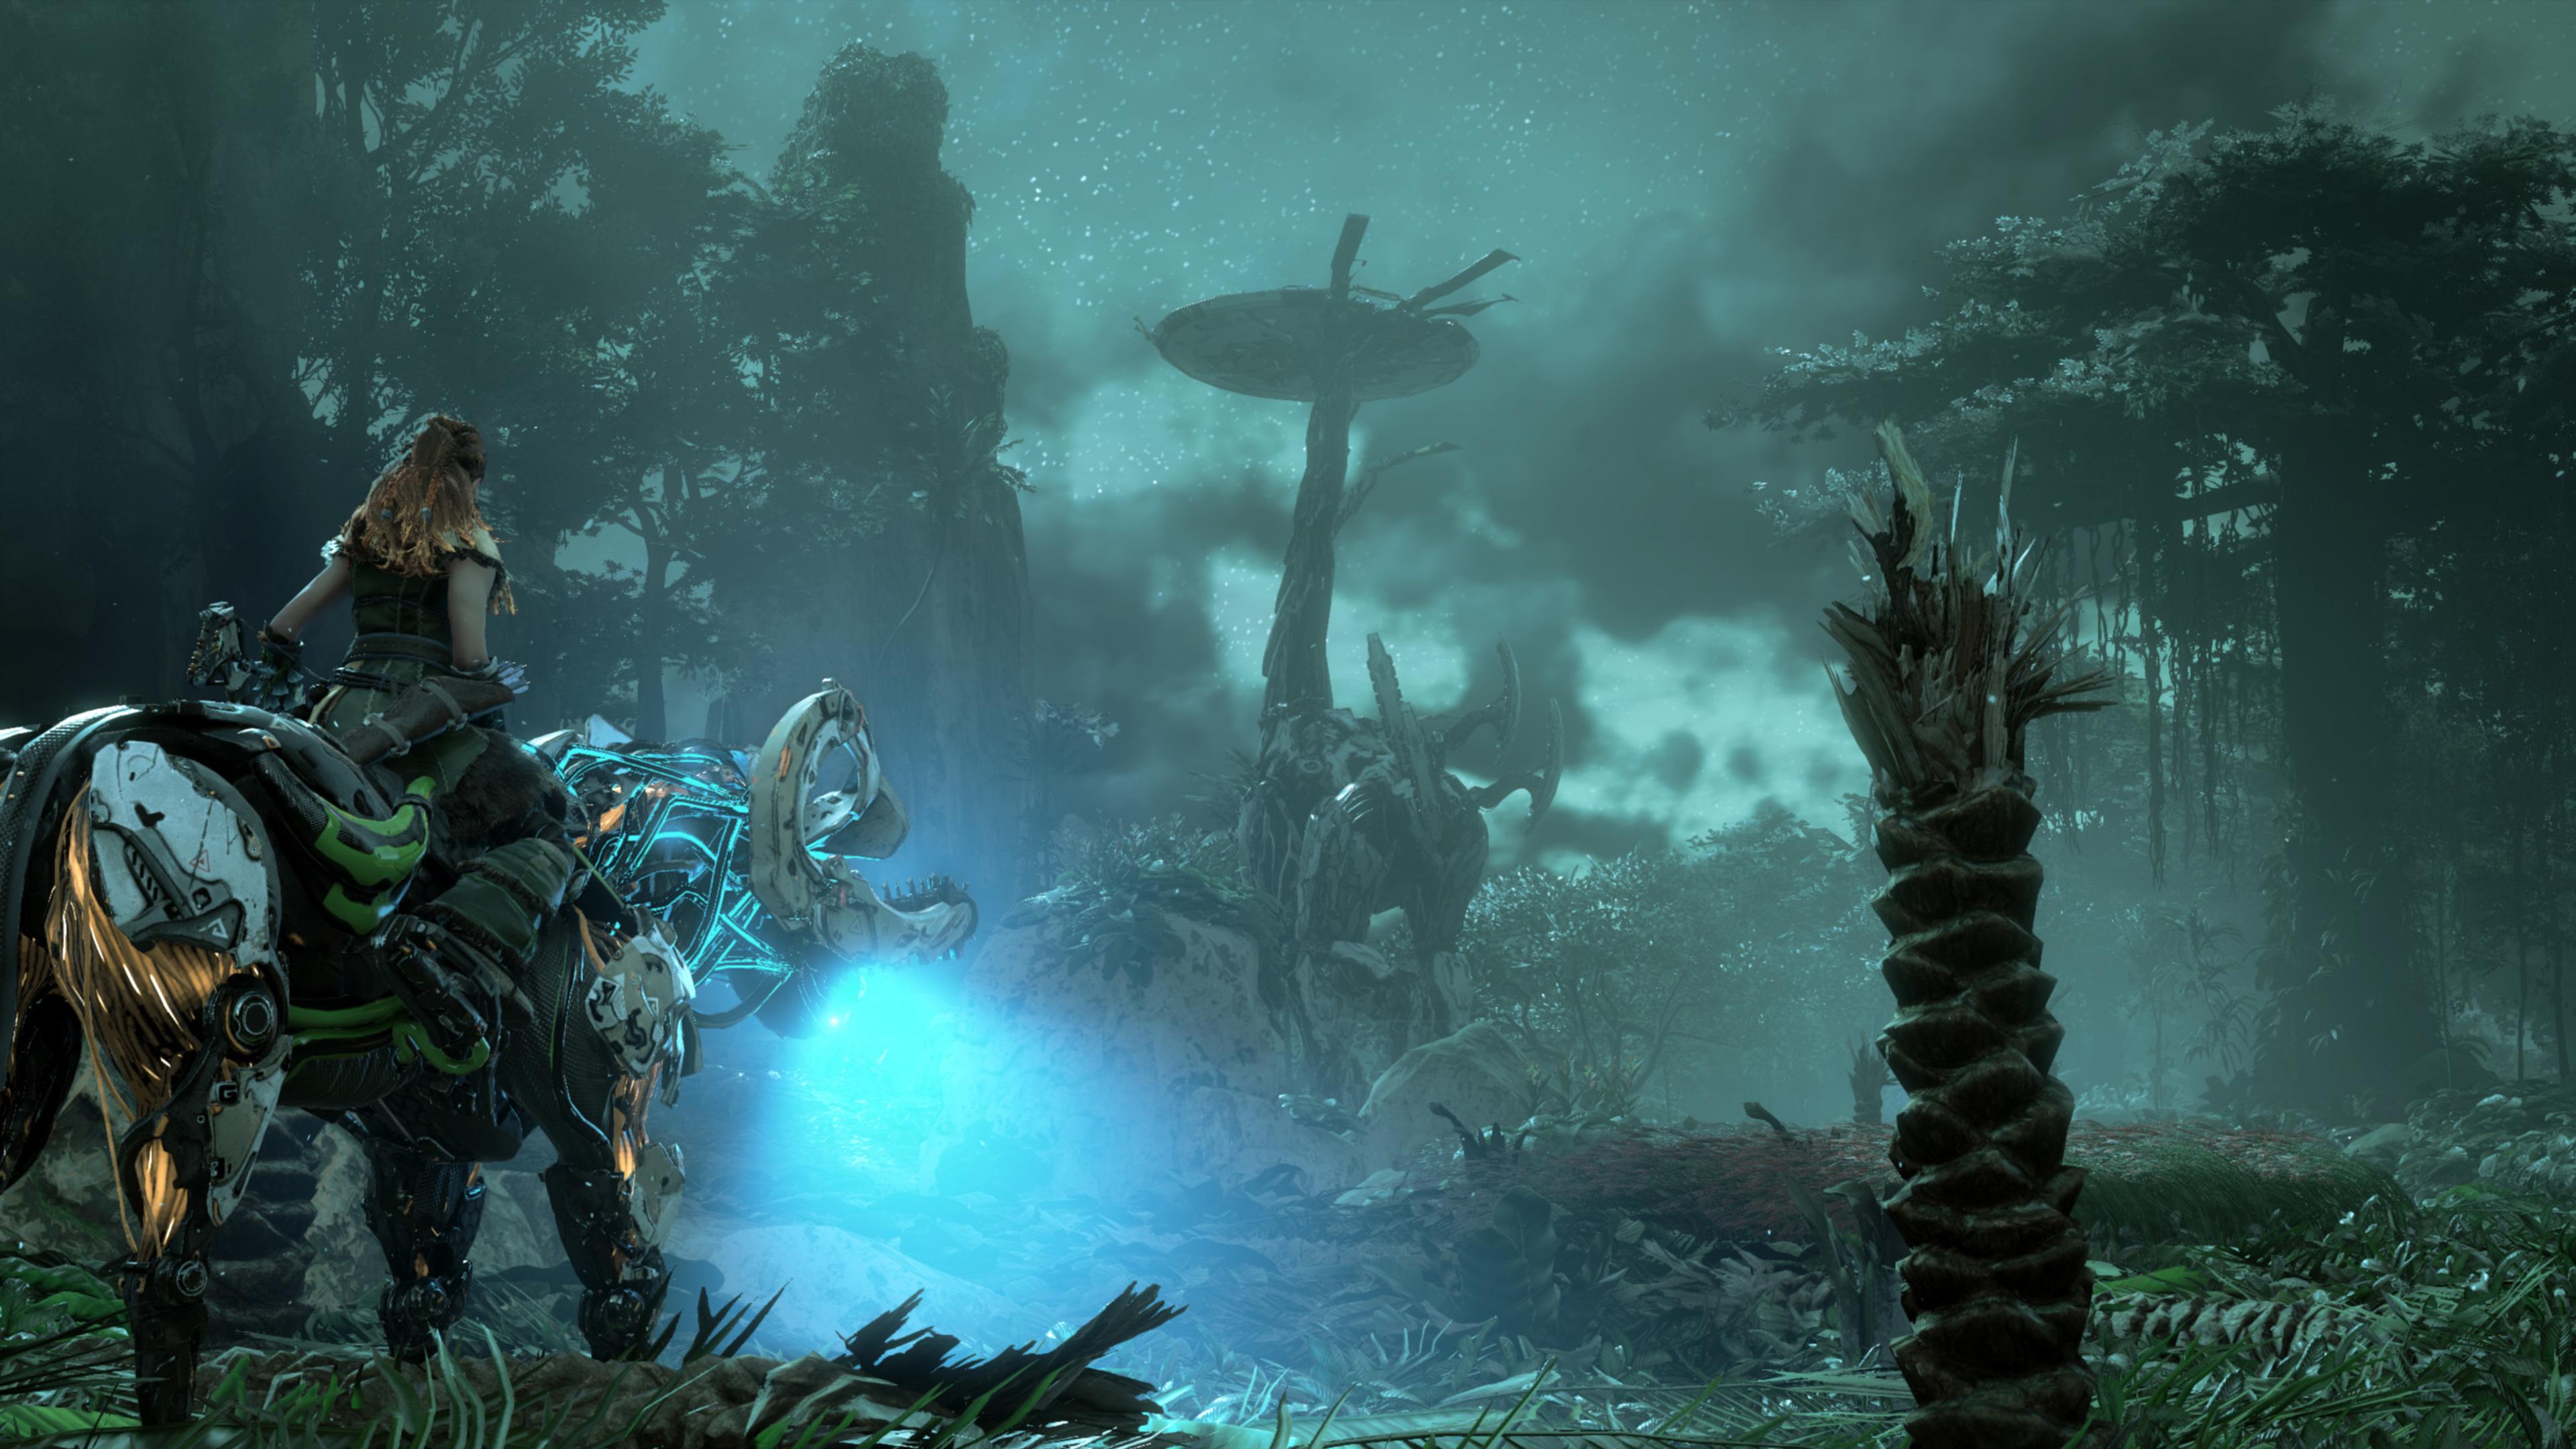 Wallpaper 4k Horizon Zero Dawn Video Game 2019 2019 Games